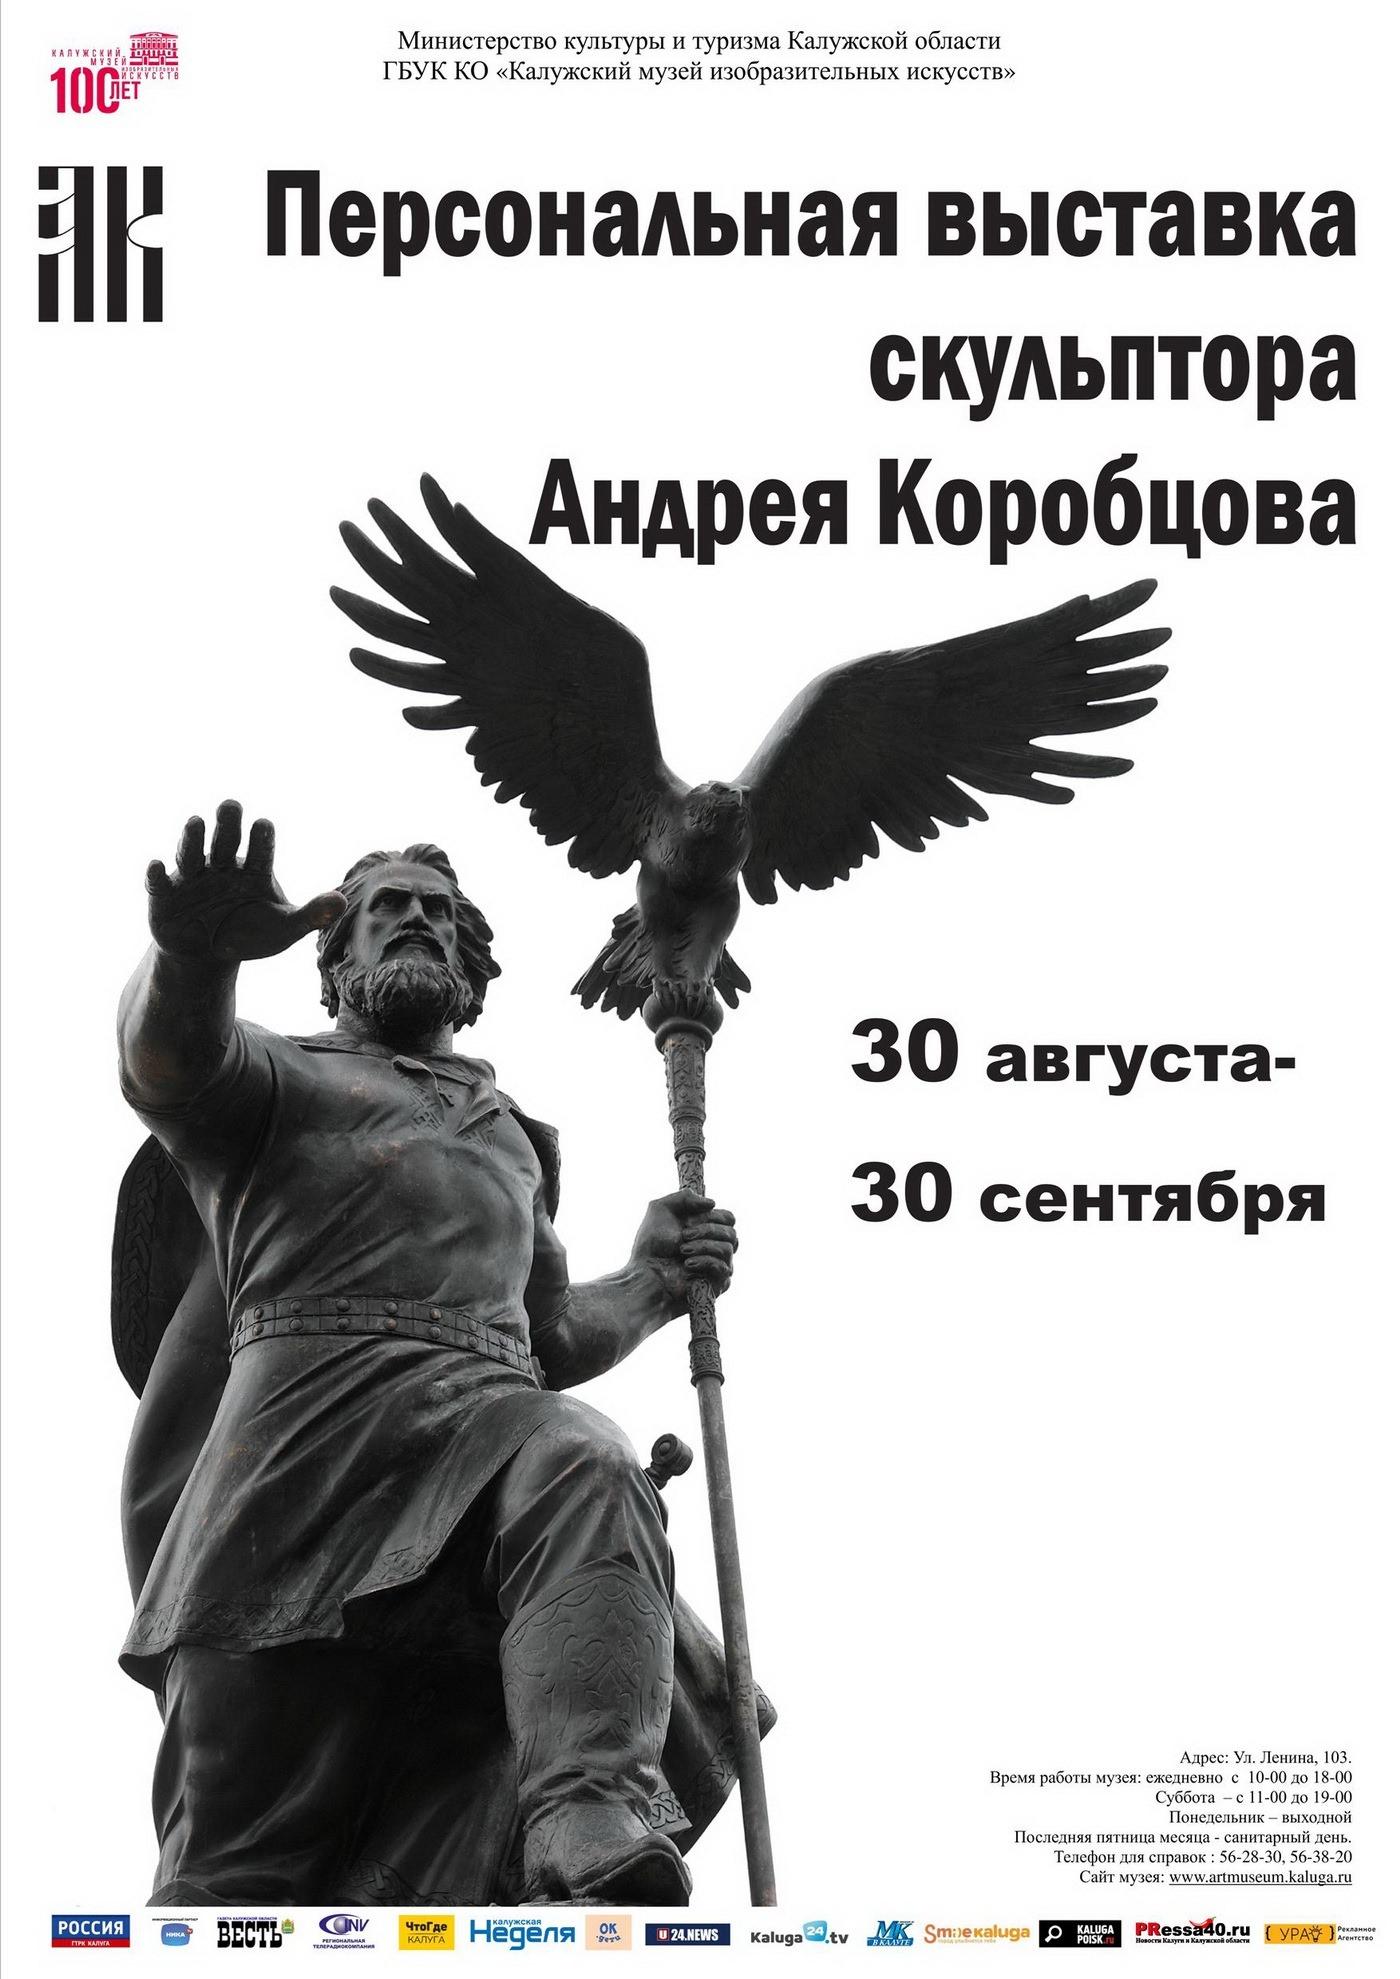 Exhibition of sculptor Andrei Korobtsov